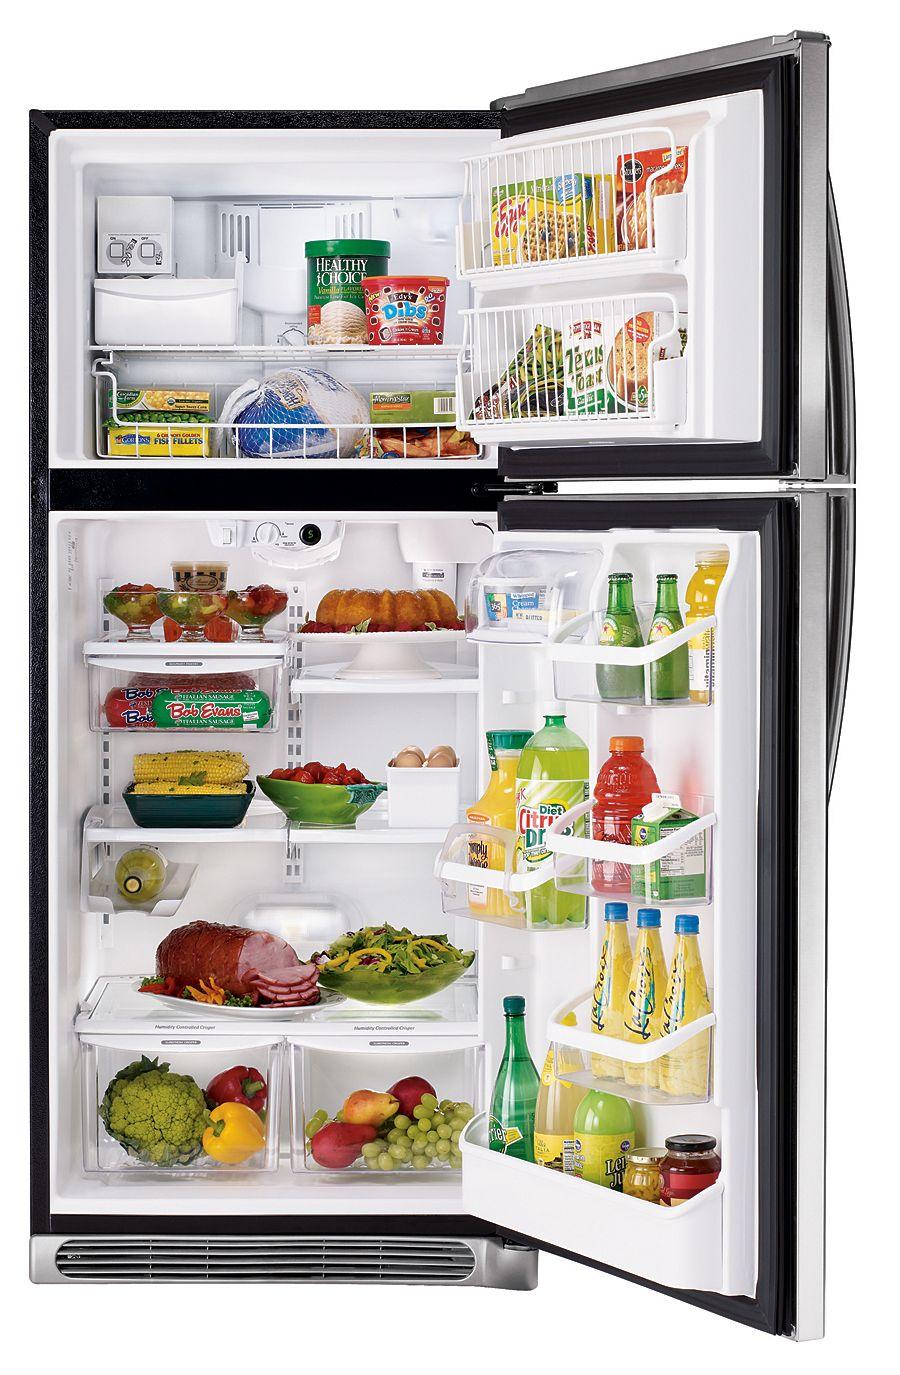 Kenmore Elite 18.2 cu. ft. Top Freezer Refrigerator